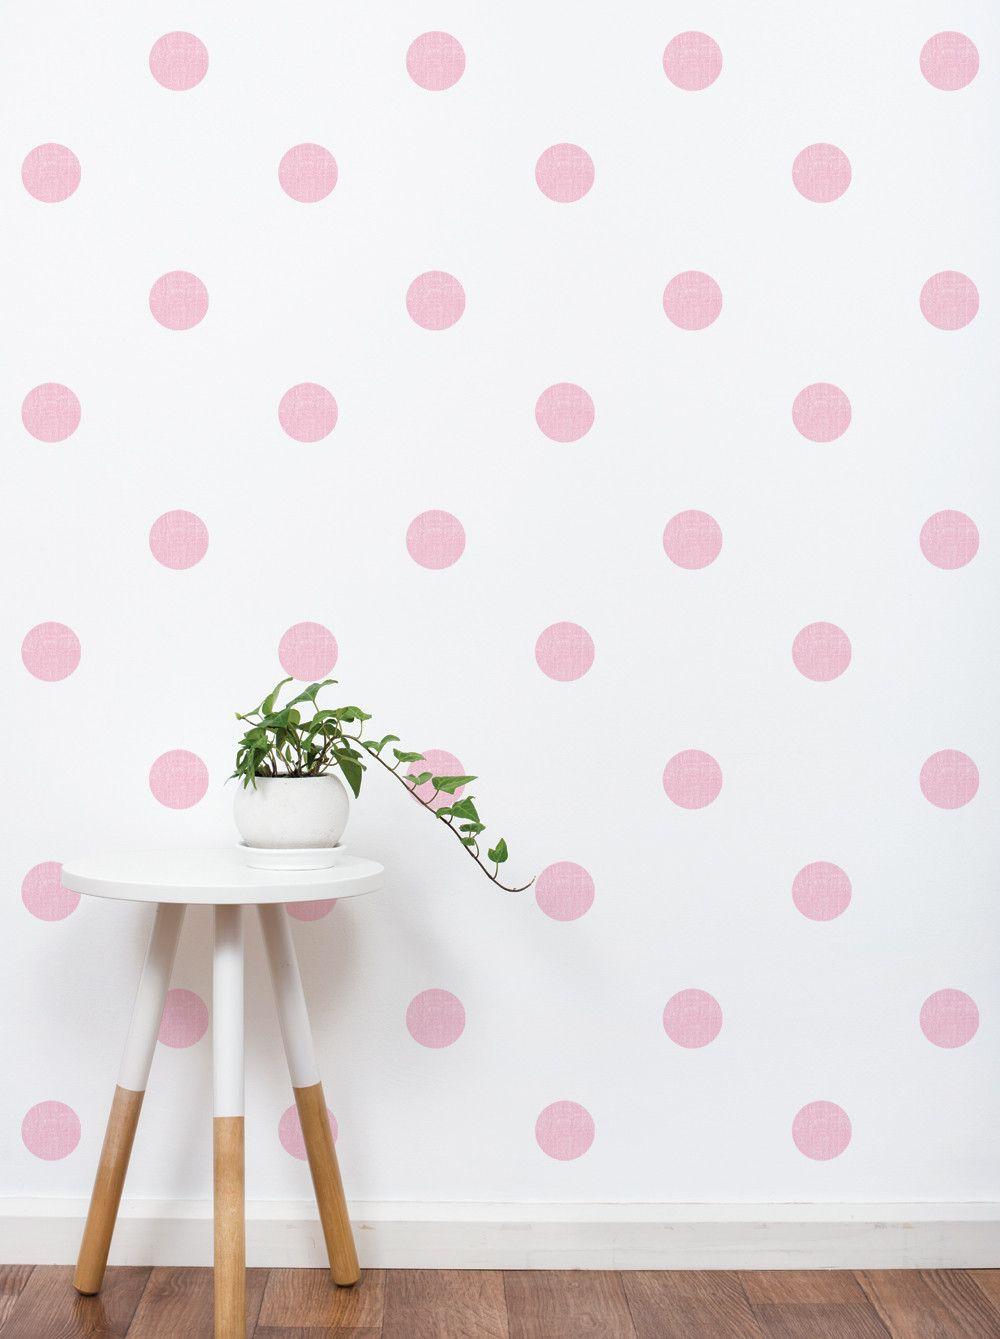 Textured dots wall sticker 3 inch polka dots wall stickers